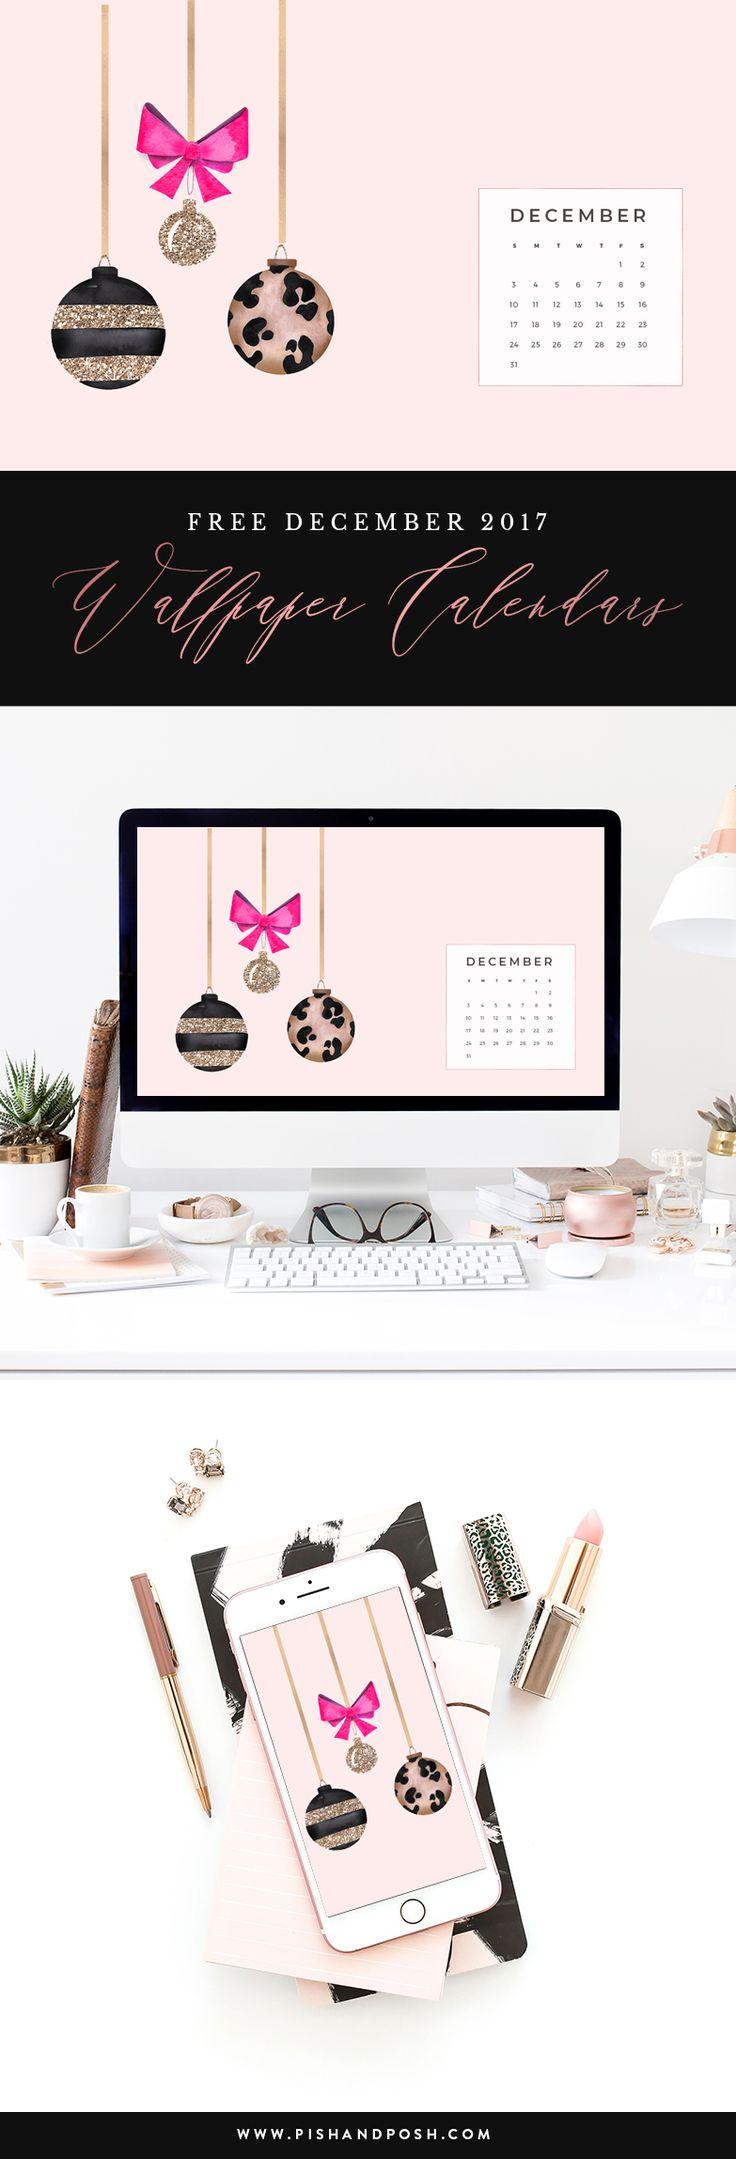 Free December 2017 Wallpaper Calendars | Pish and Posh Designs